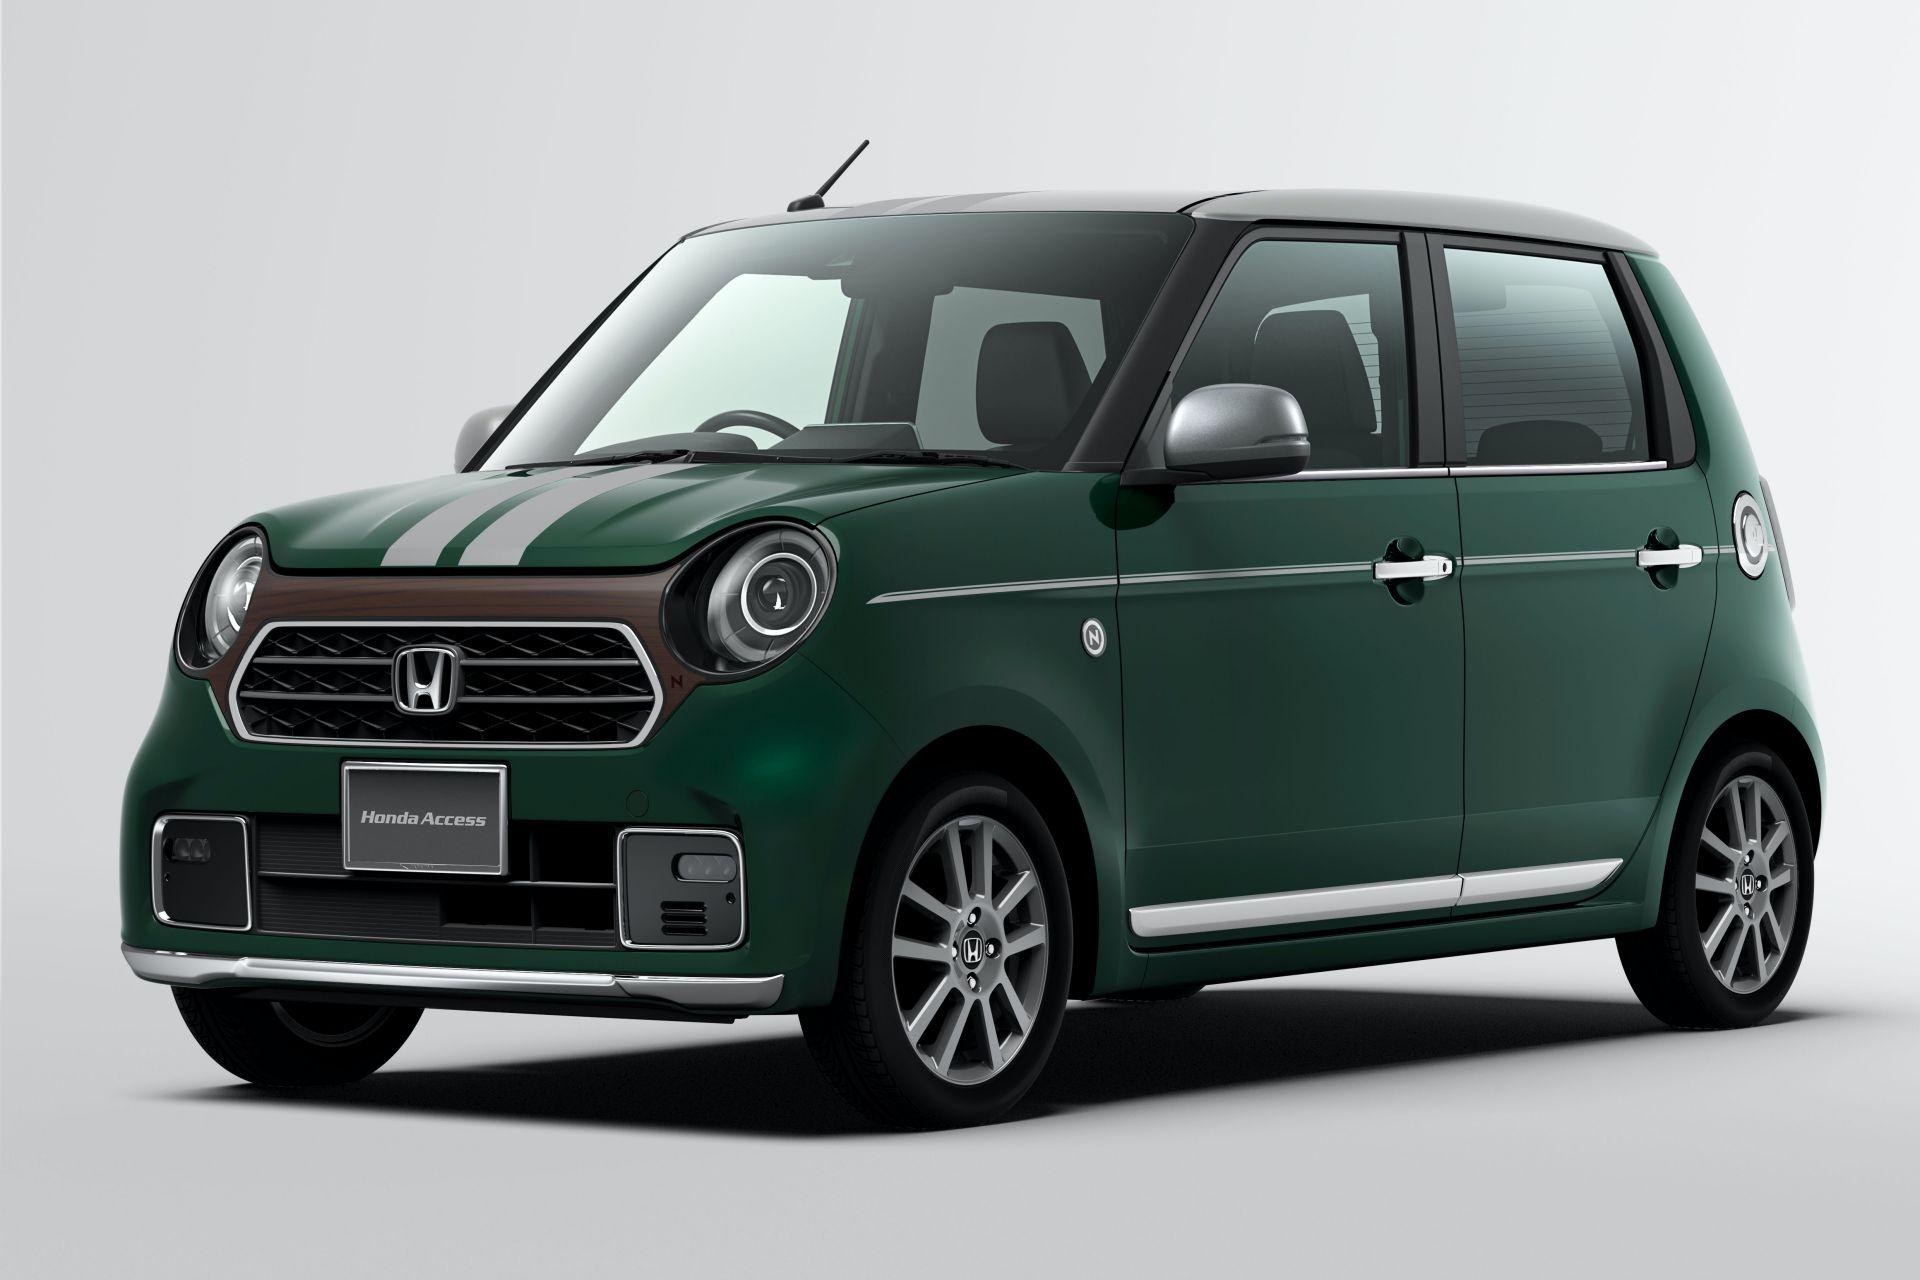 Honda-Access-for-2021-N-One-JDM-spec-6-1